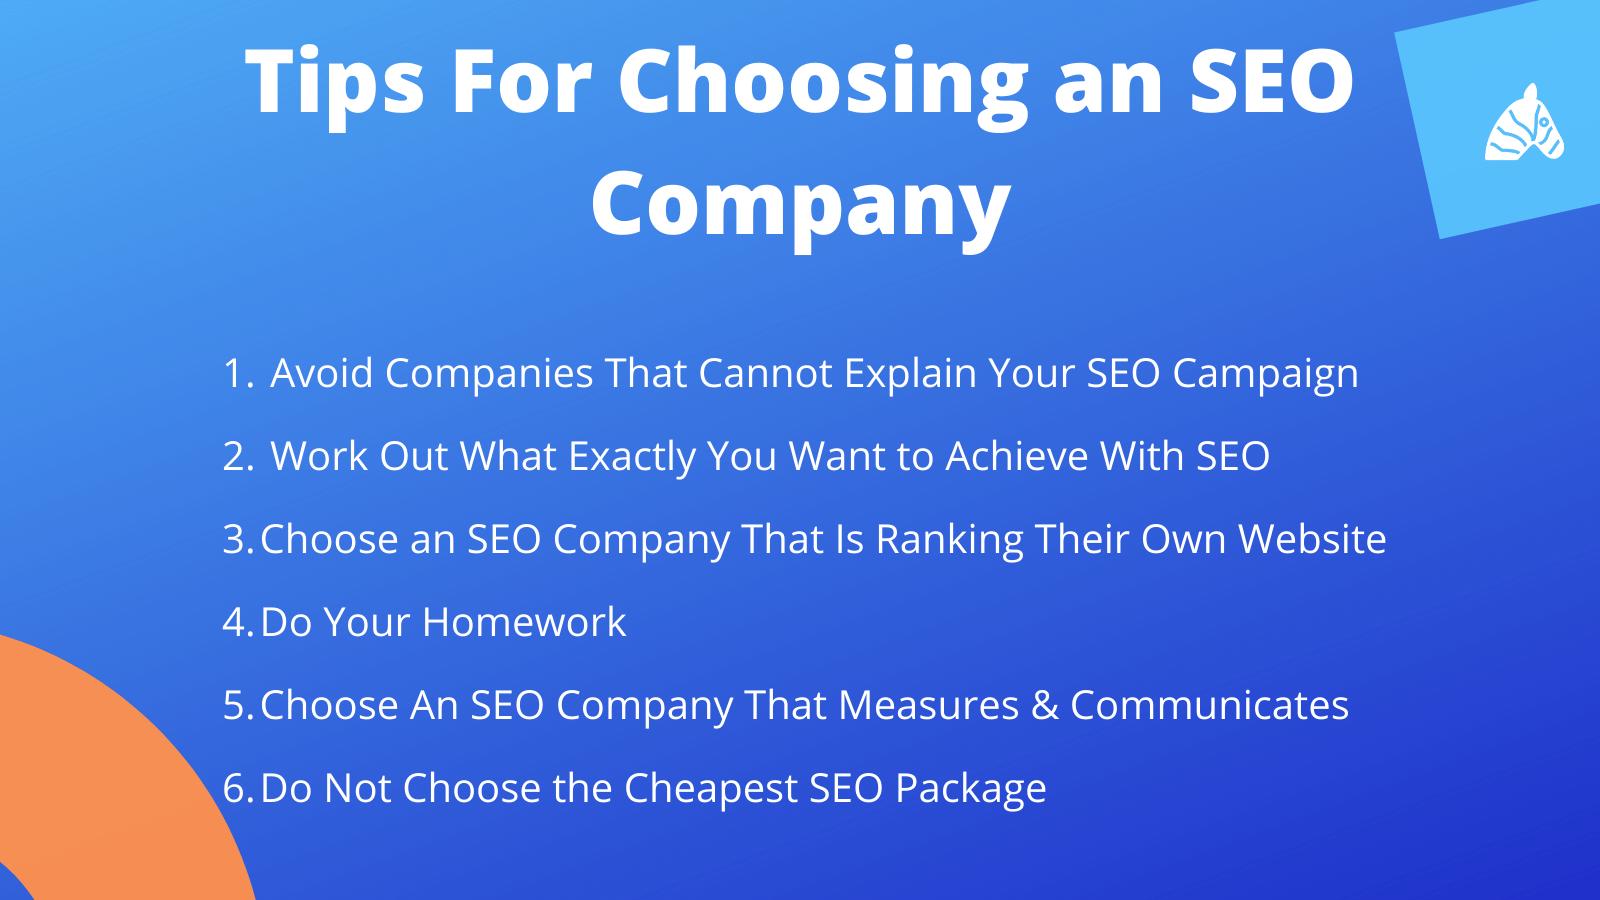 How To Choose an SEO Company